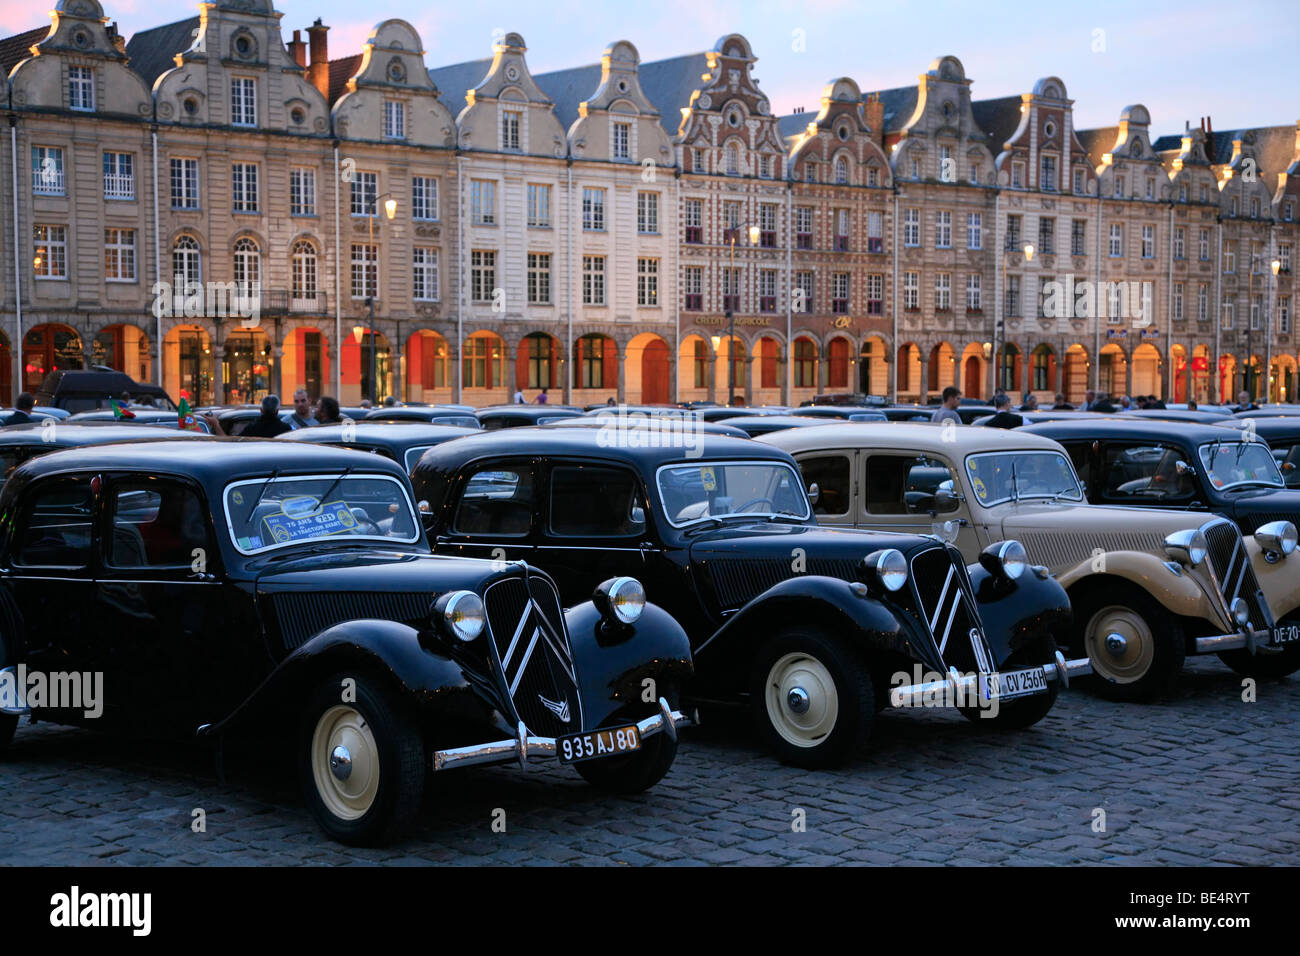 france classic car show stock photos france classic car show stock images alamy. Black Bedroom Furniture Sets. Home Design Ideas